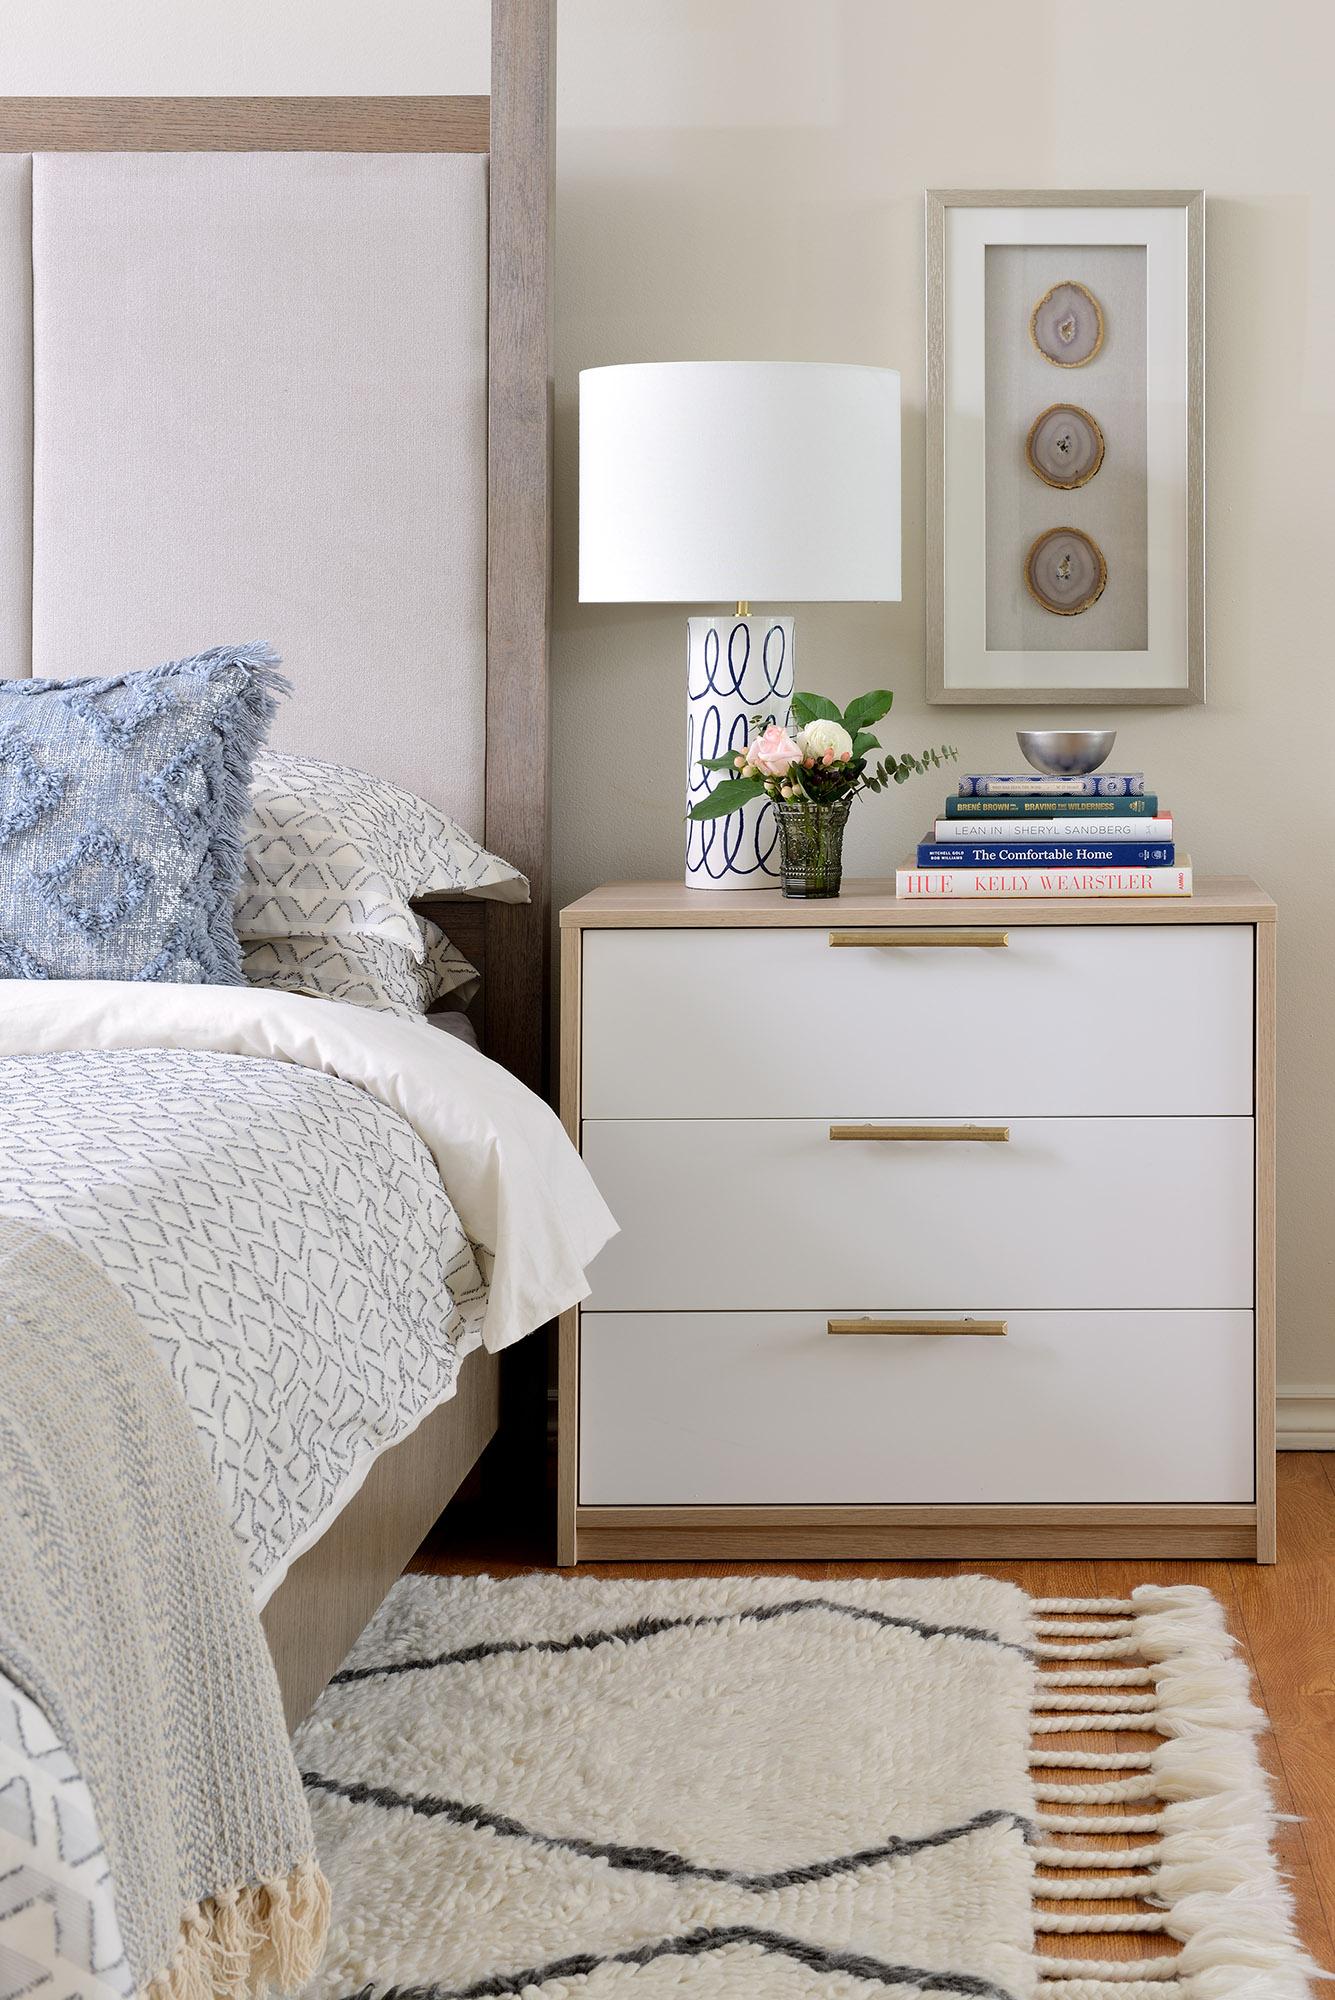 Ikea Dorm Room Ideas: Askvoll Hack - Google Search